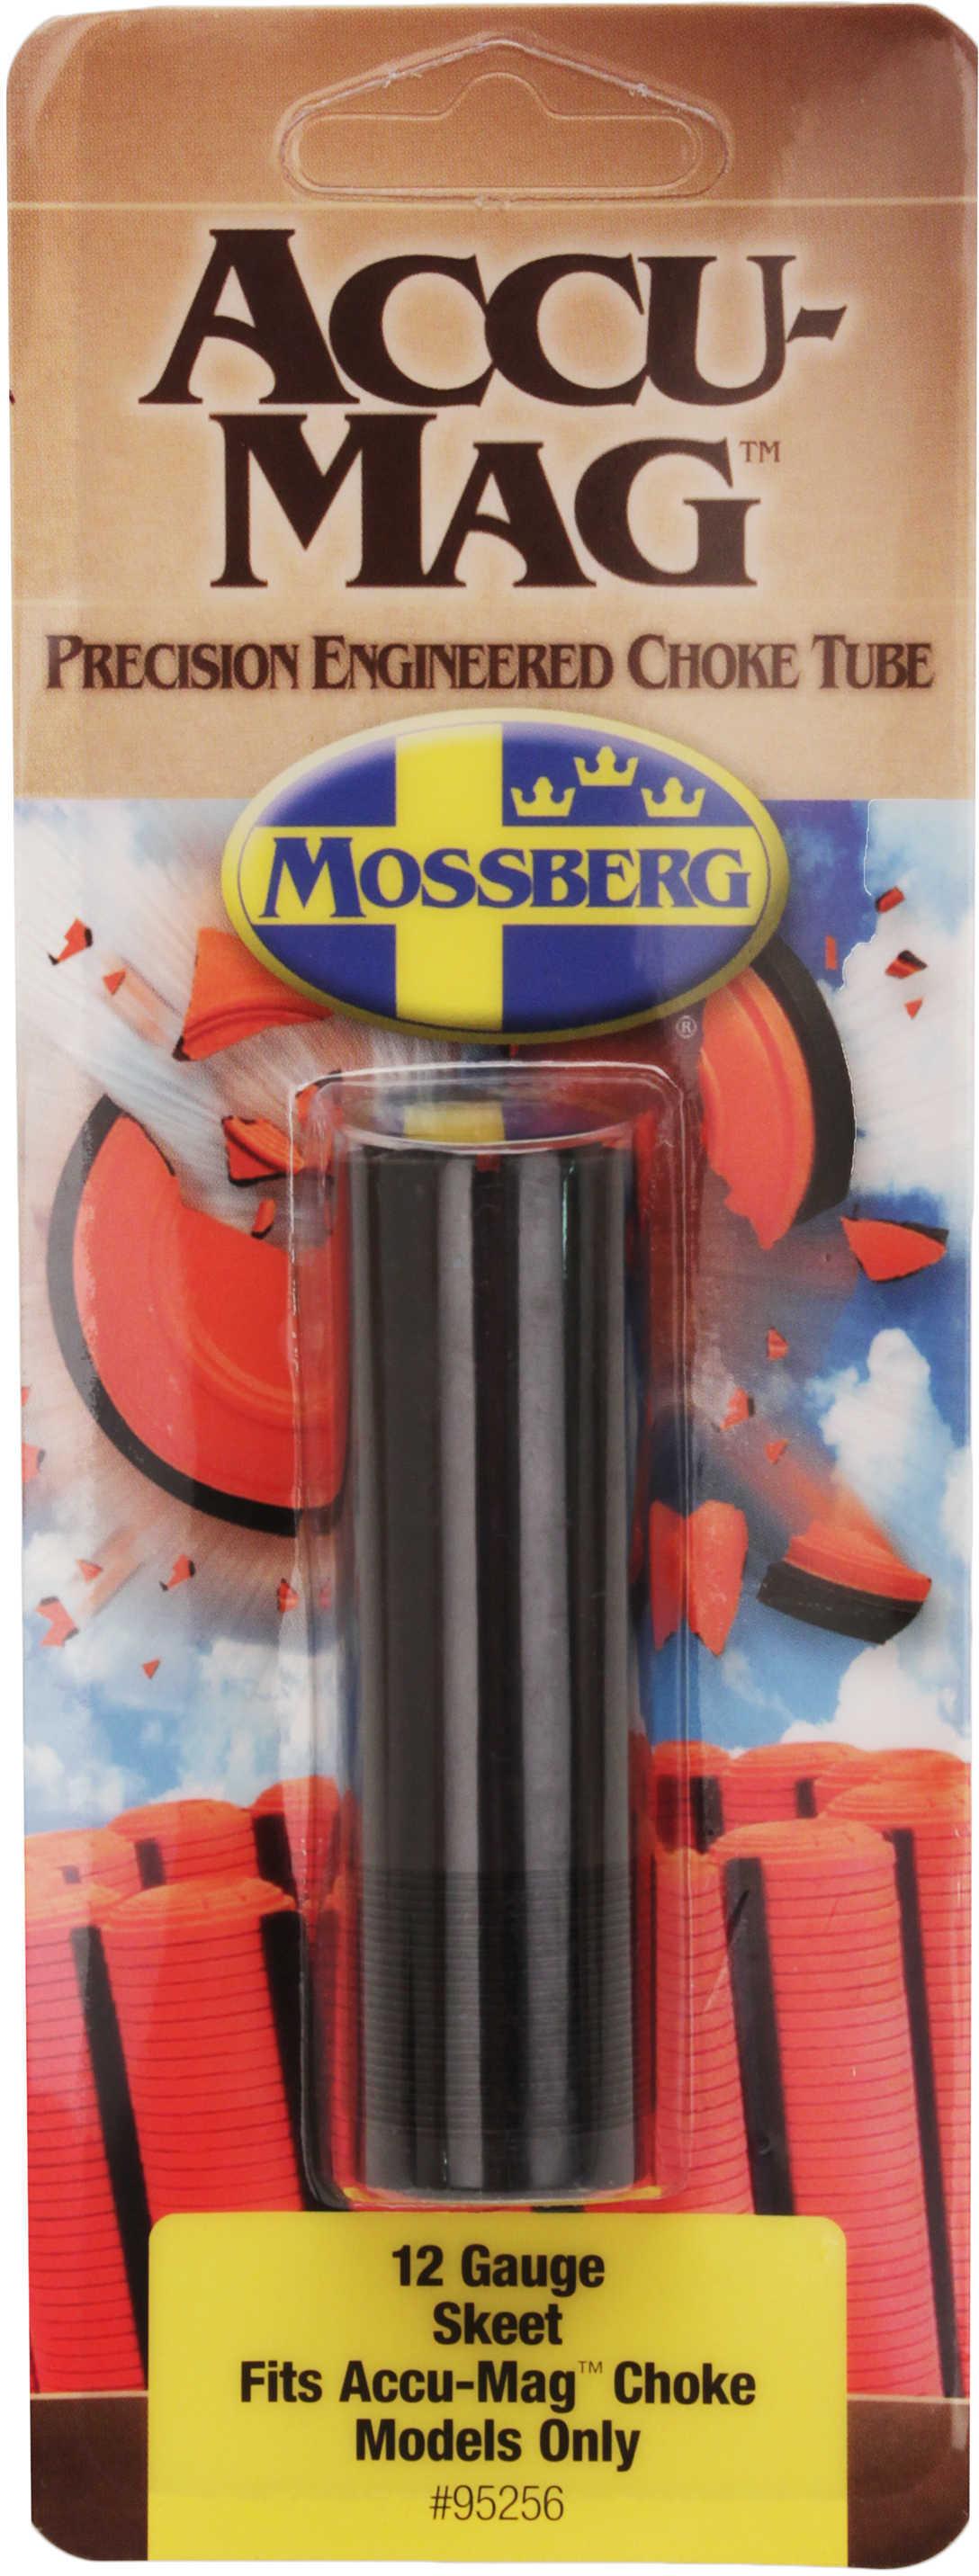 Mossberg 12 Gauge Choke Tube 835,935 Skeet Md. 95256